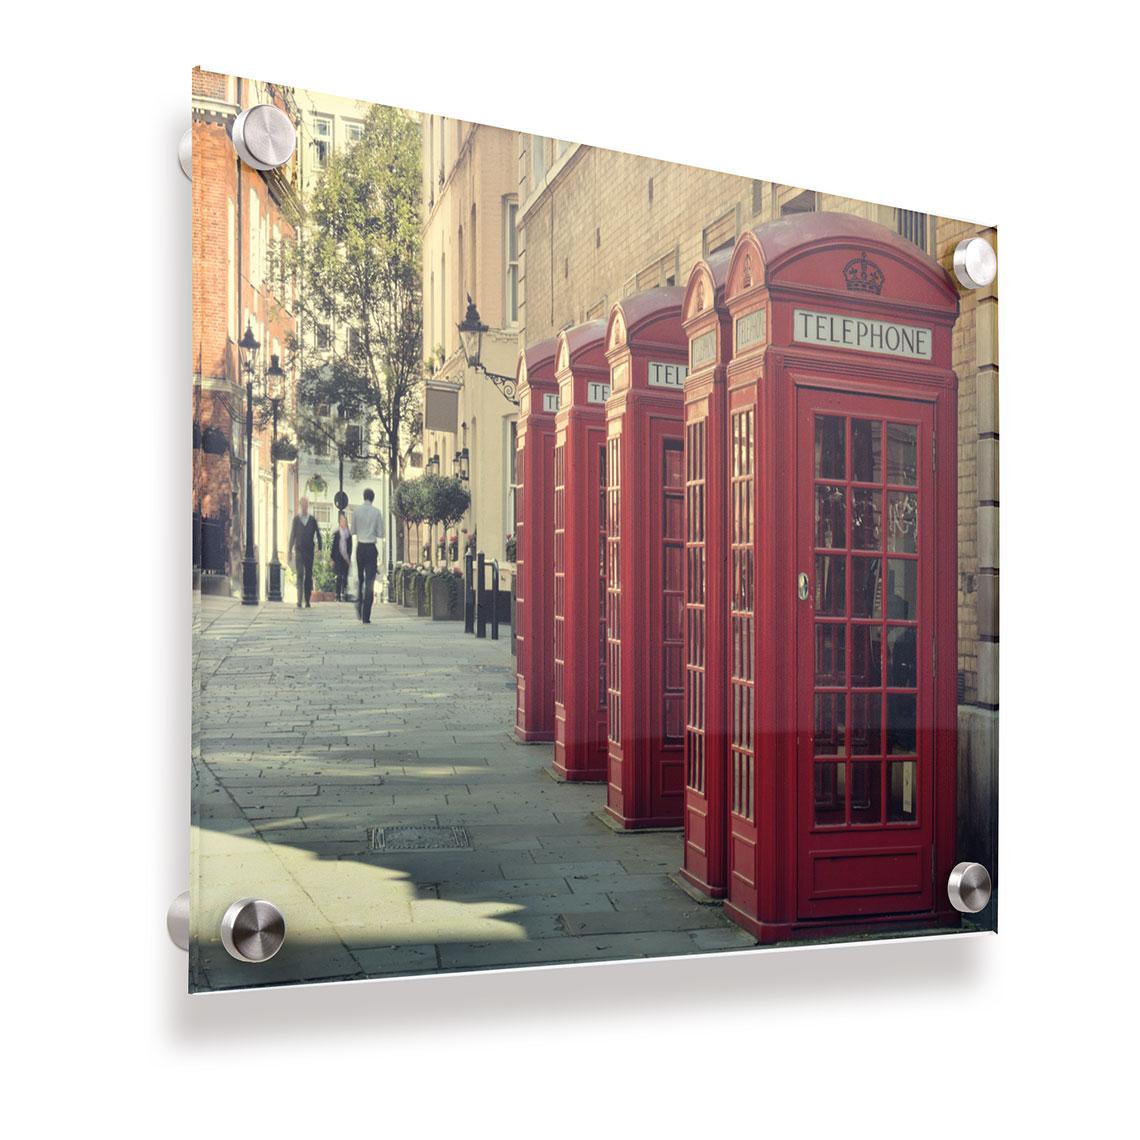 10x10 wall mounted acrylic photo print 25x25cm wall mounted